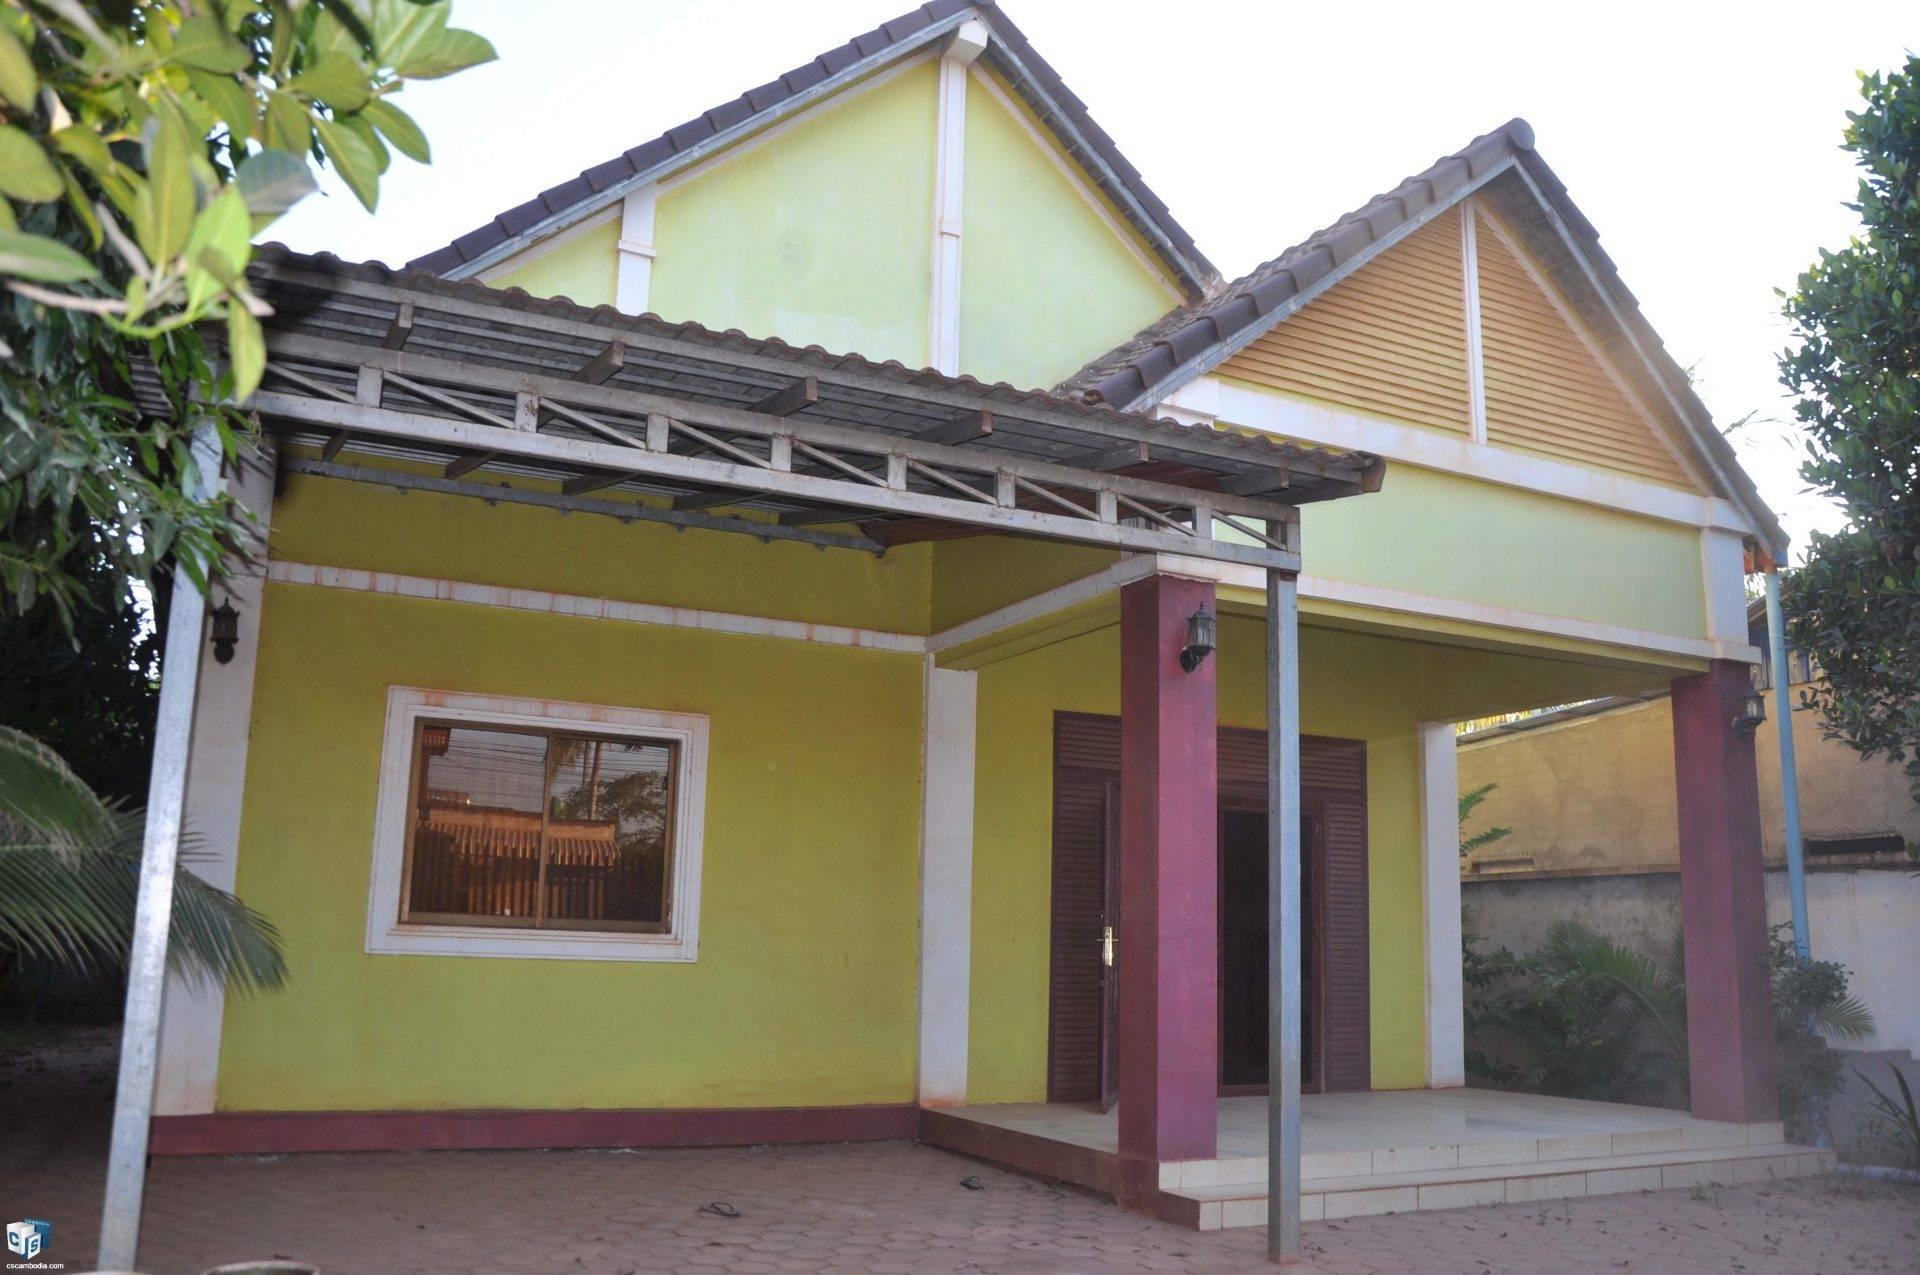 4 Bedroom House – For Rent – Svay Dangkum Commune – Siem Reap